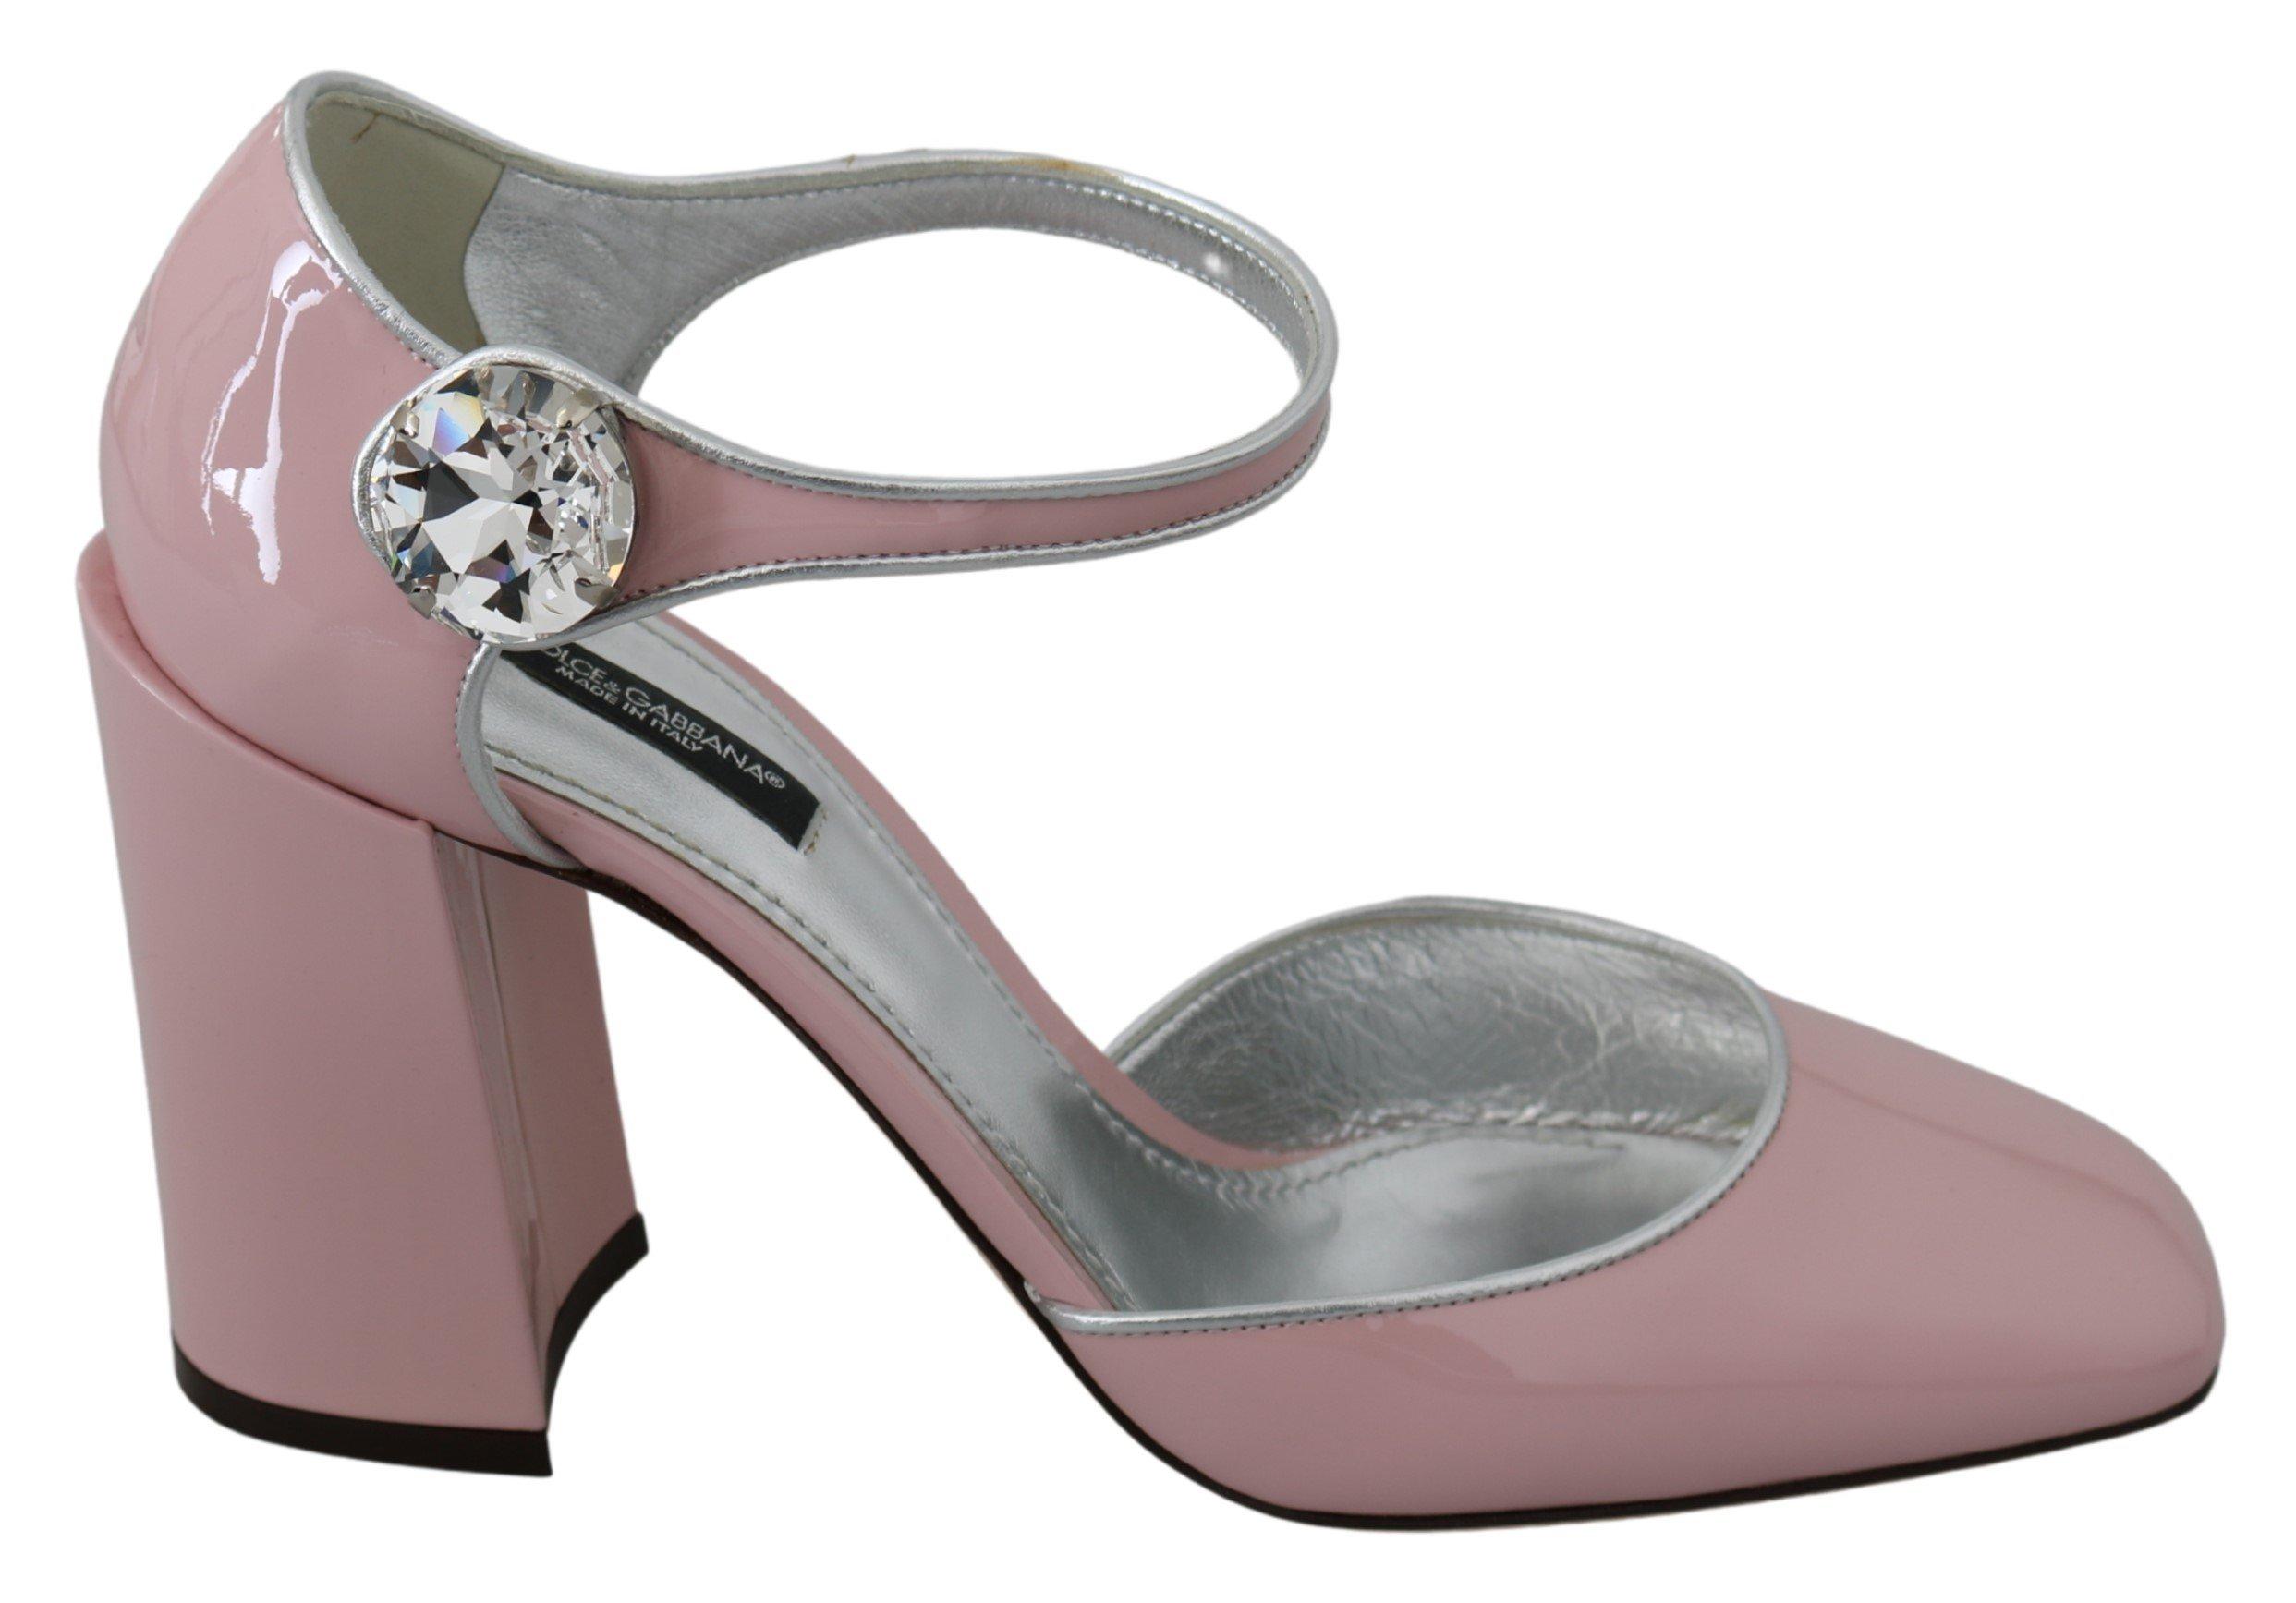 Dolce & Gabbana Women's Leather Crystal Sandal Pink LA7329 - EU39/US8.5